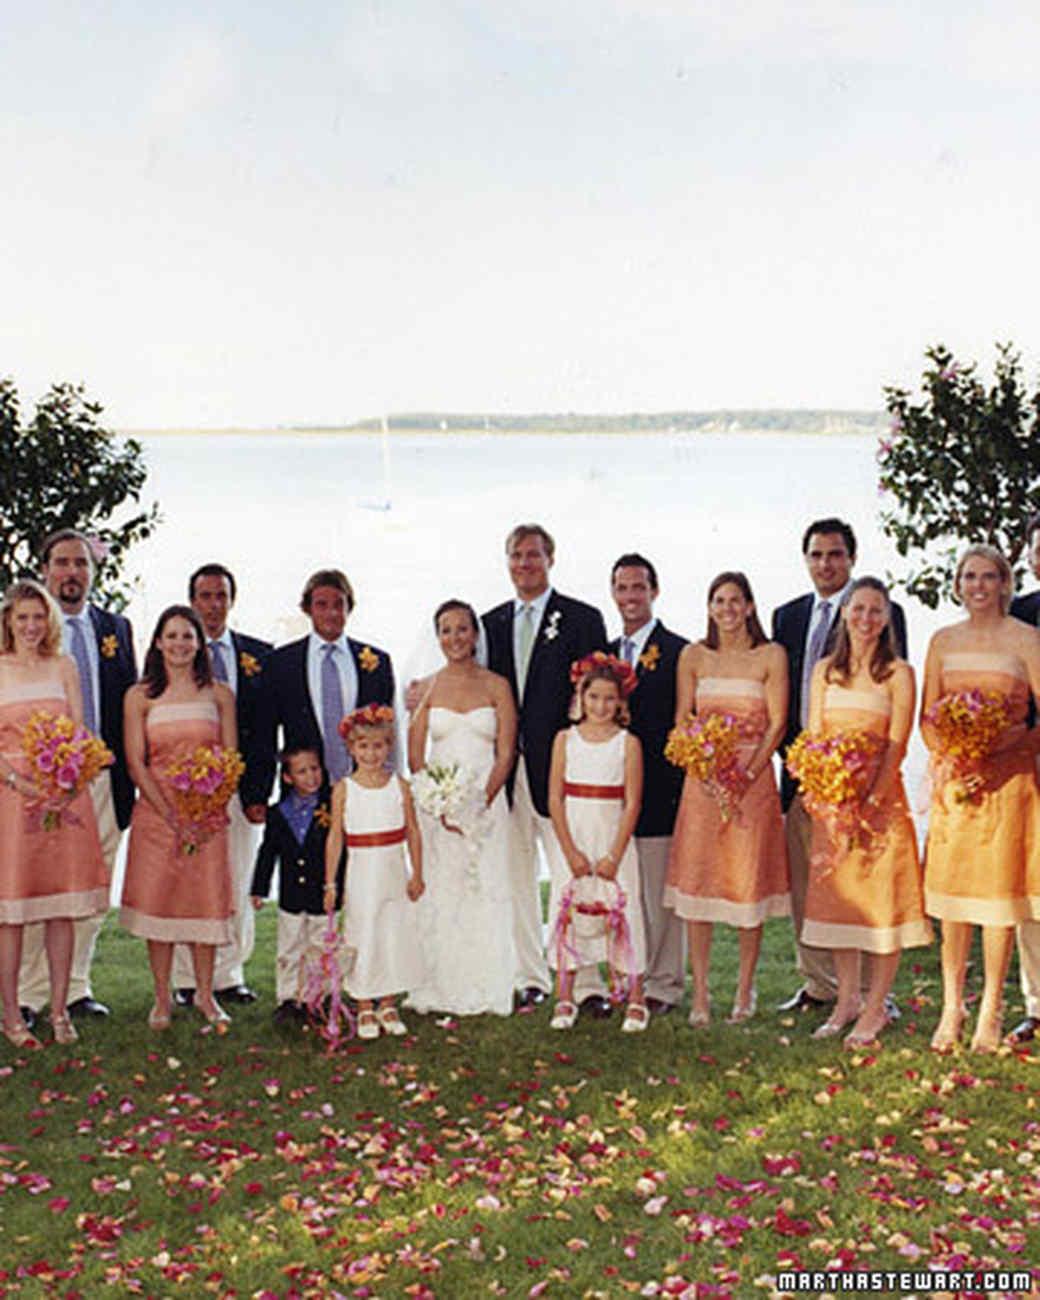 ac217e2183b Choosing the Wedding Party